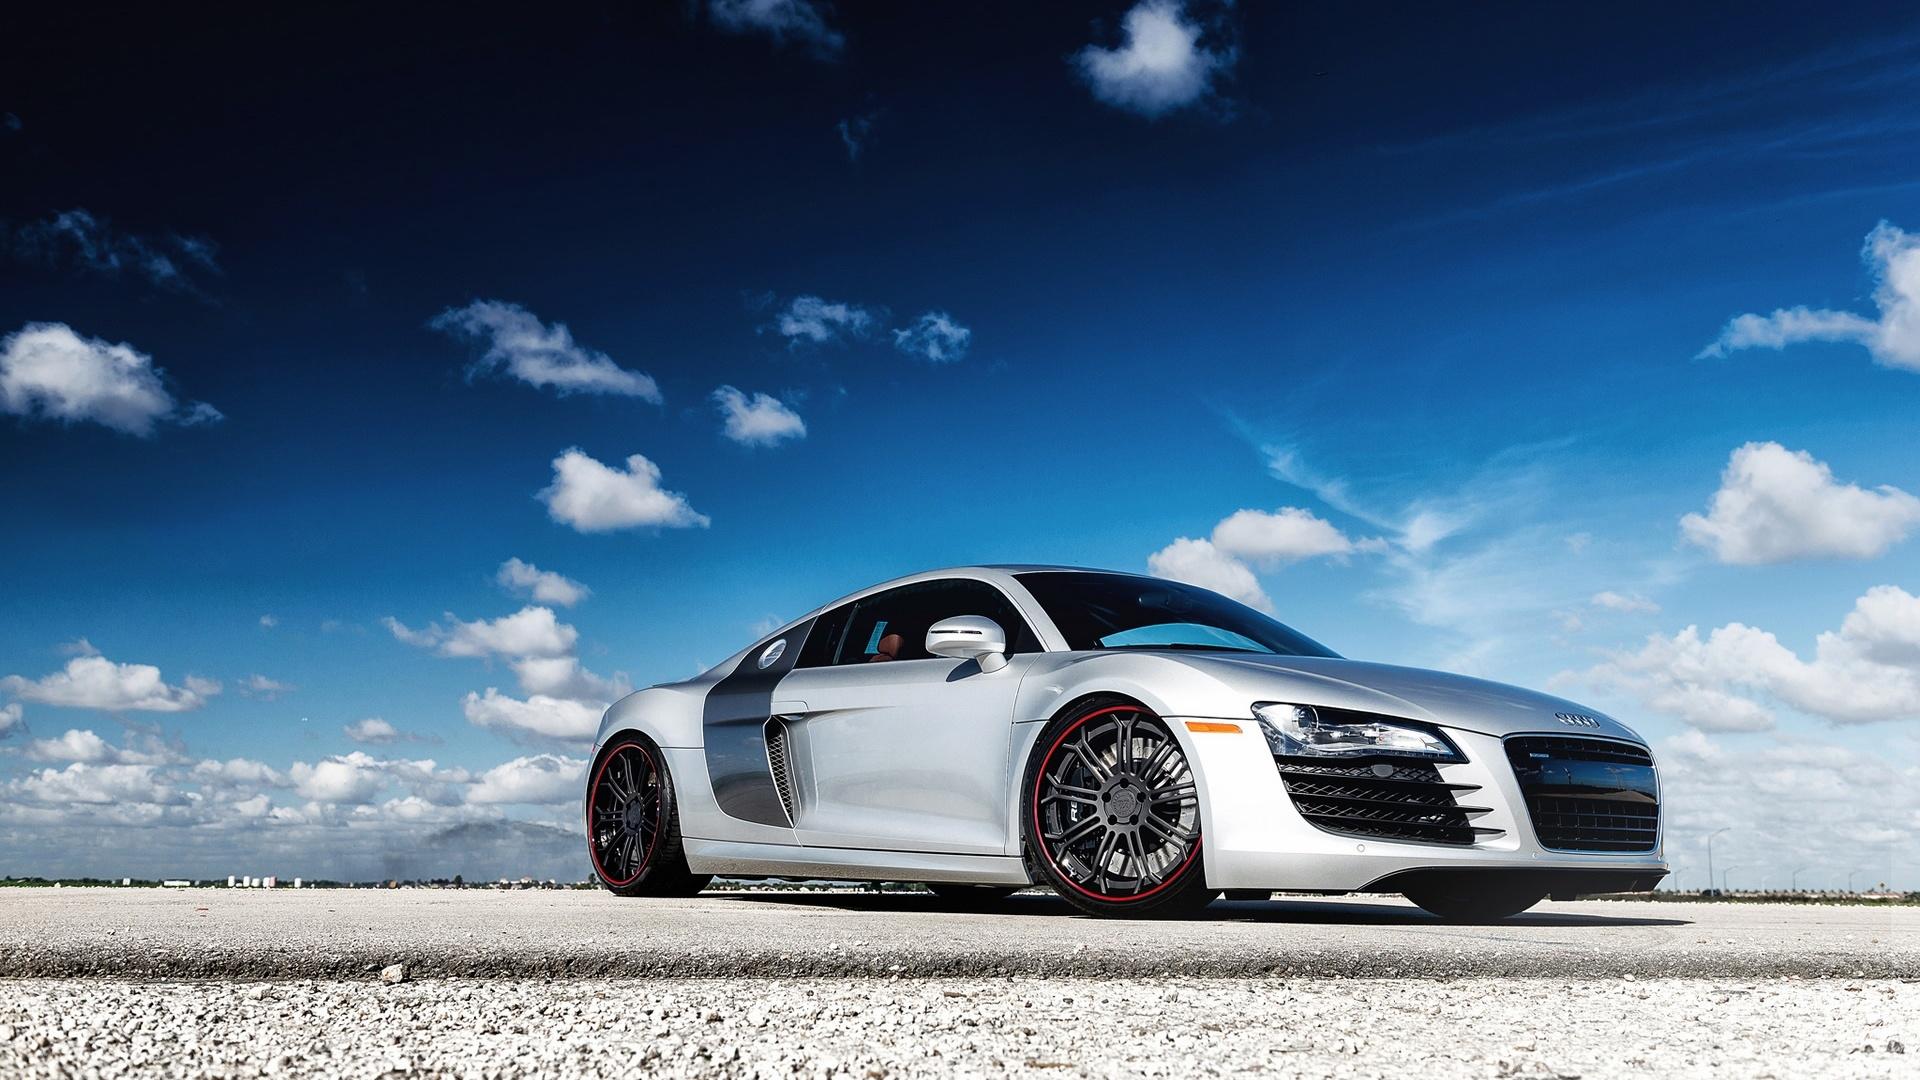 75 Super Sports Cars Wallpapers On Wallpapersafari